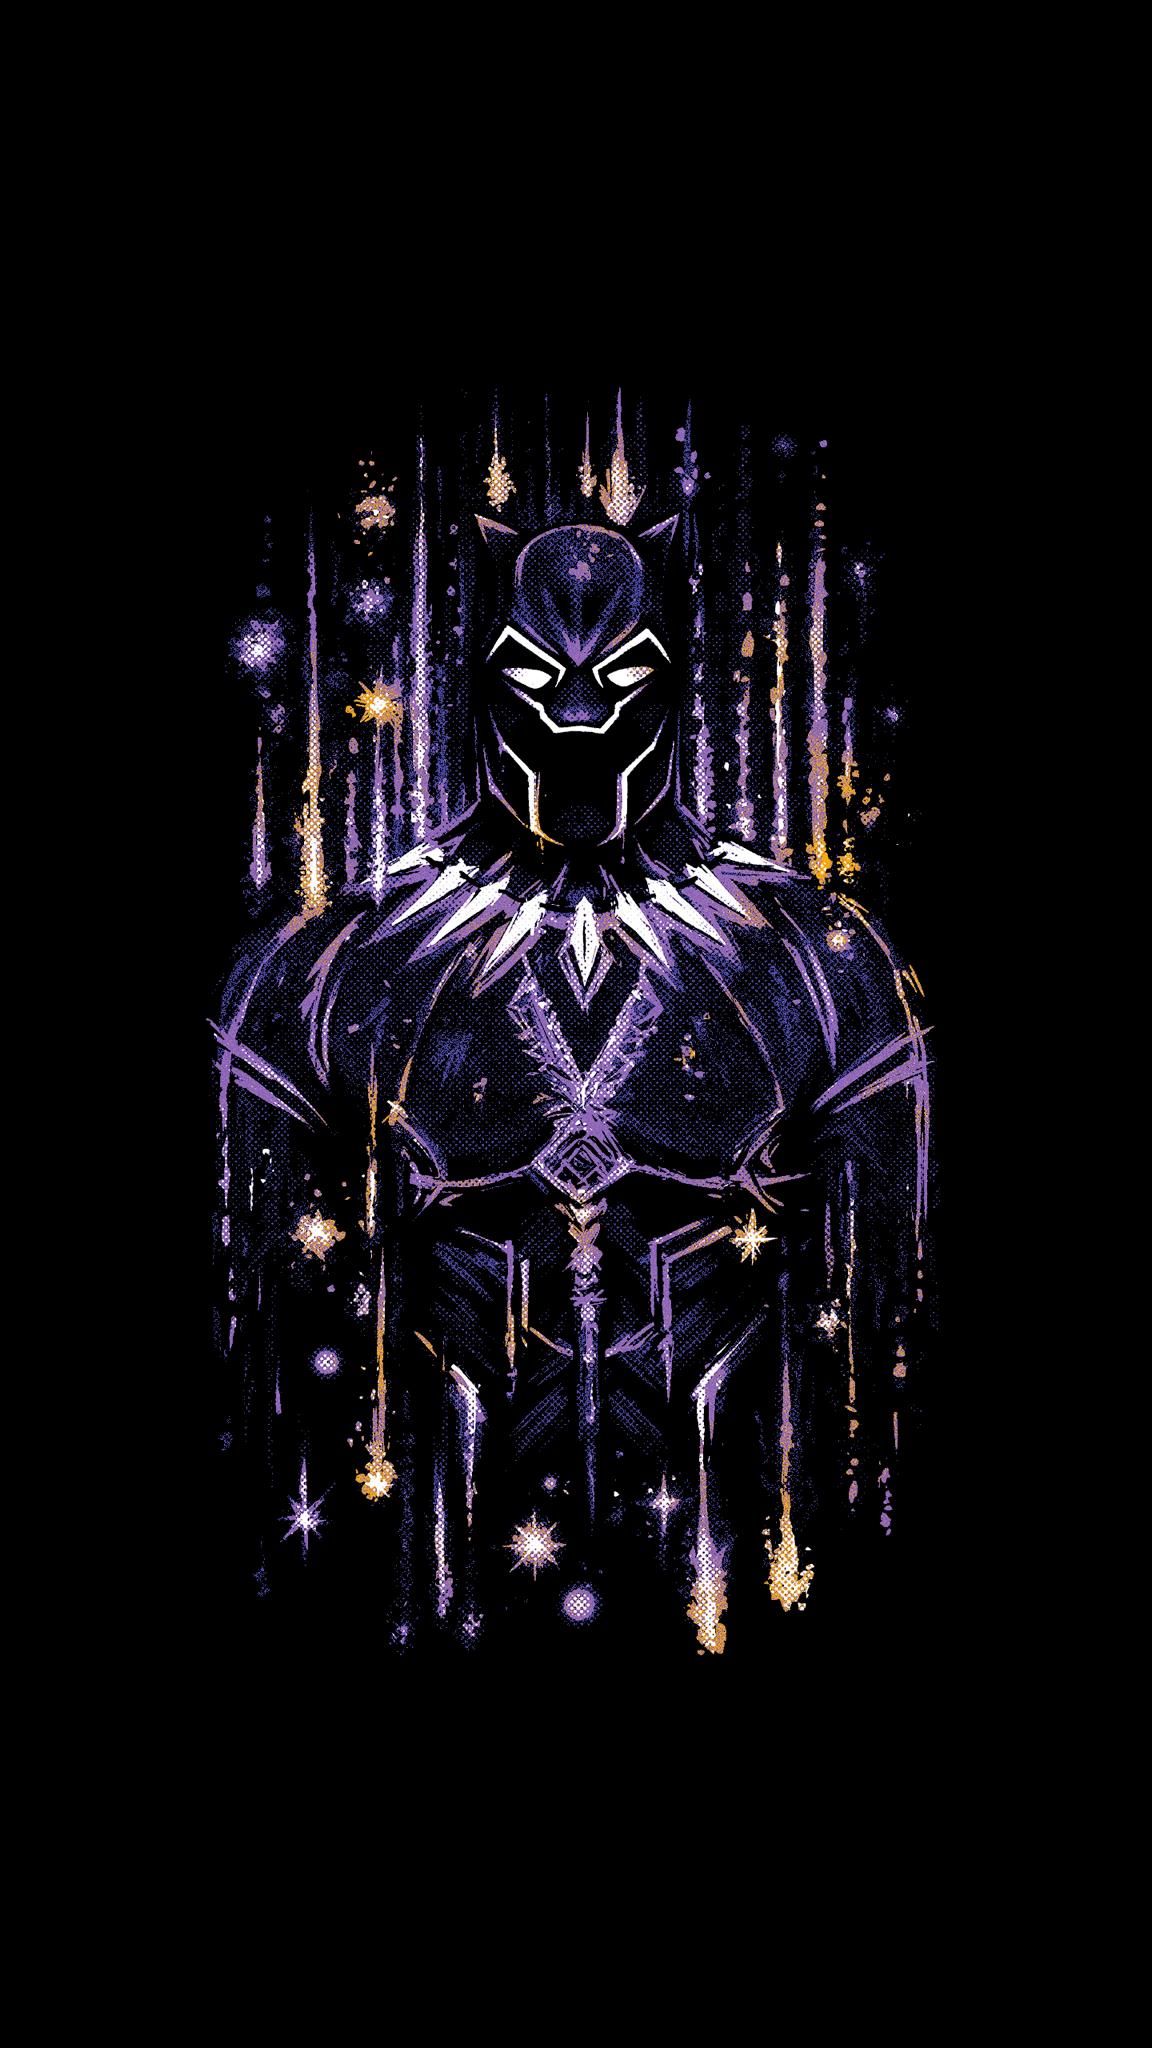 Black Panther Wallpaper Px Black Panther Wallpaper Wakanda 955458 Hd Wallpaper Backgrounds Download